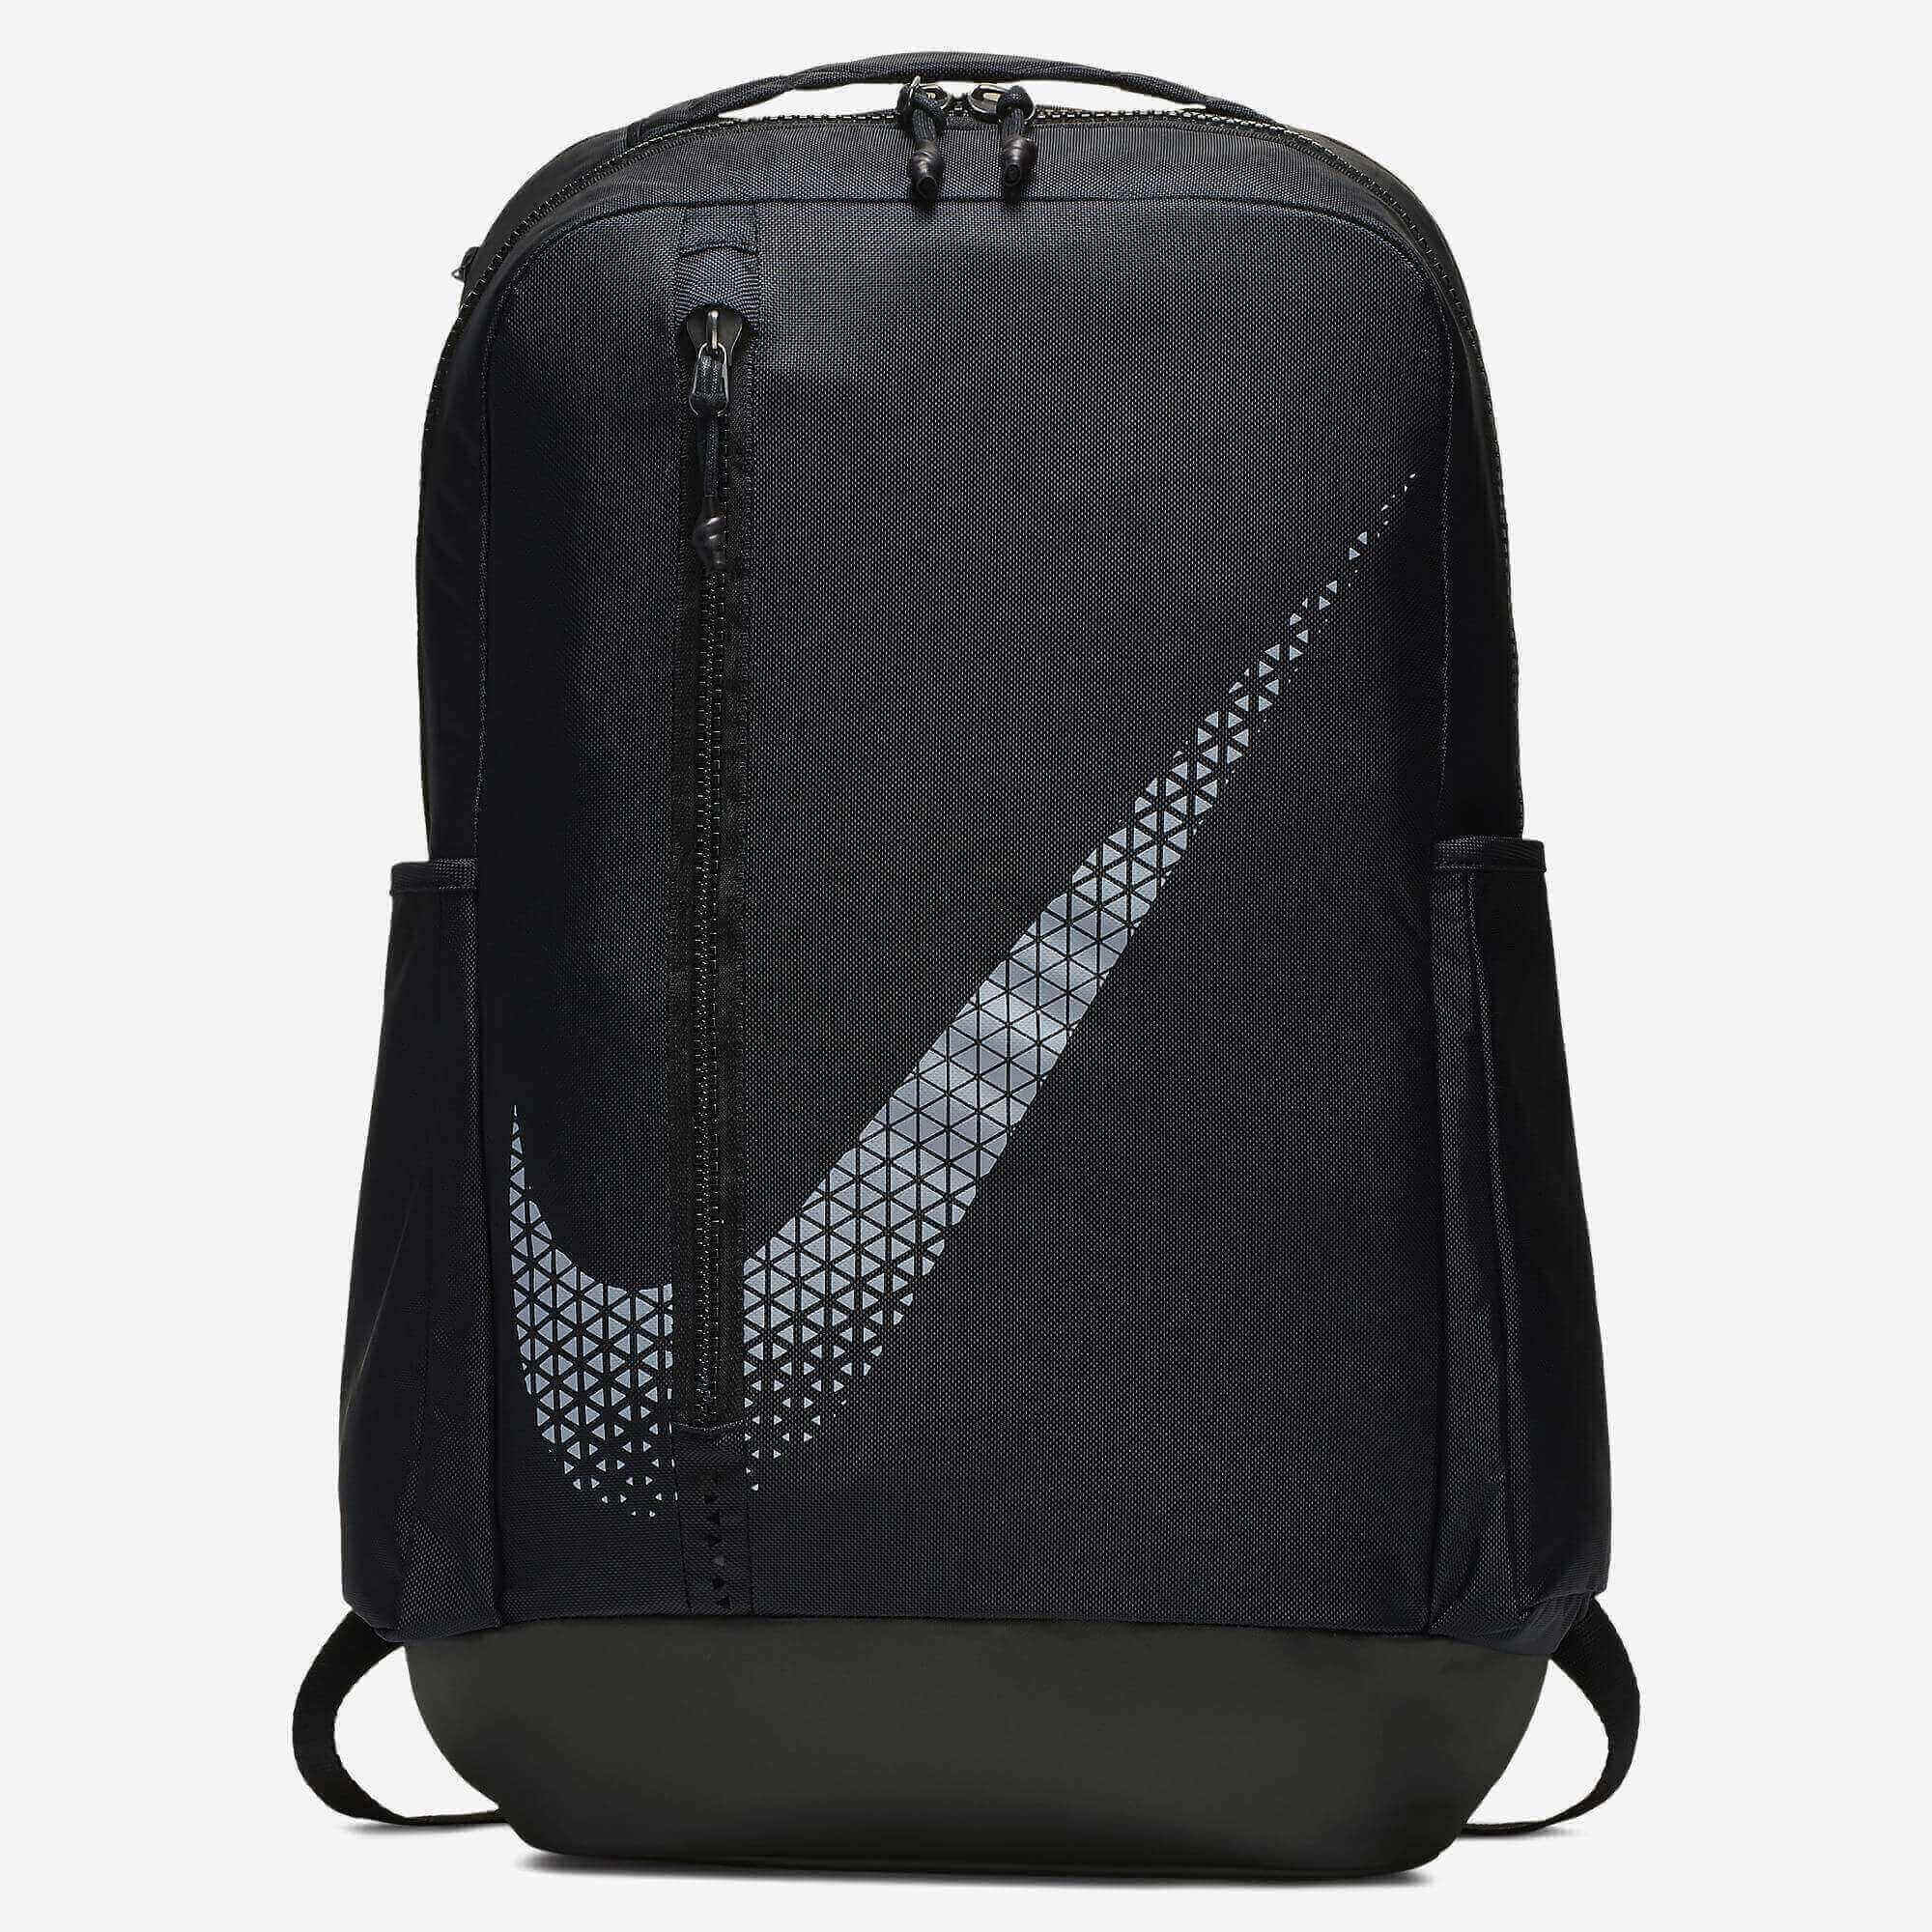 Mochila Nike Vapor Power Compartimento Laptop